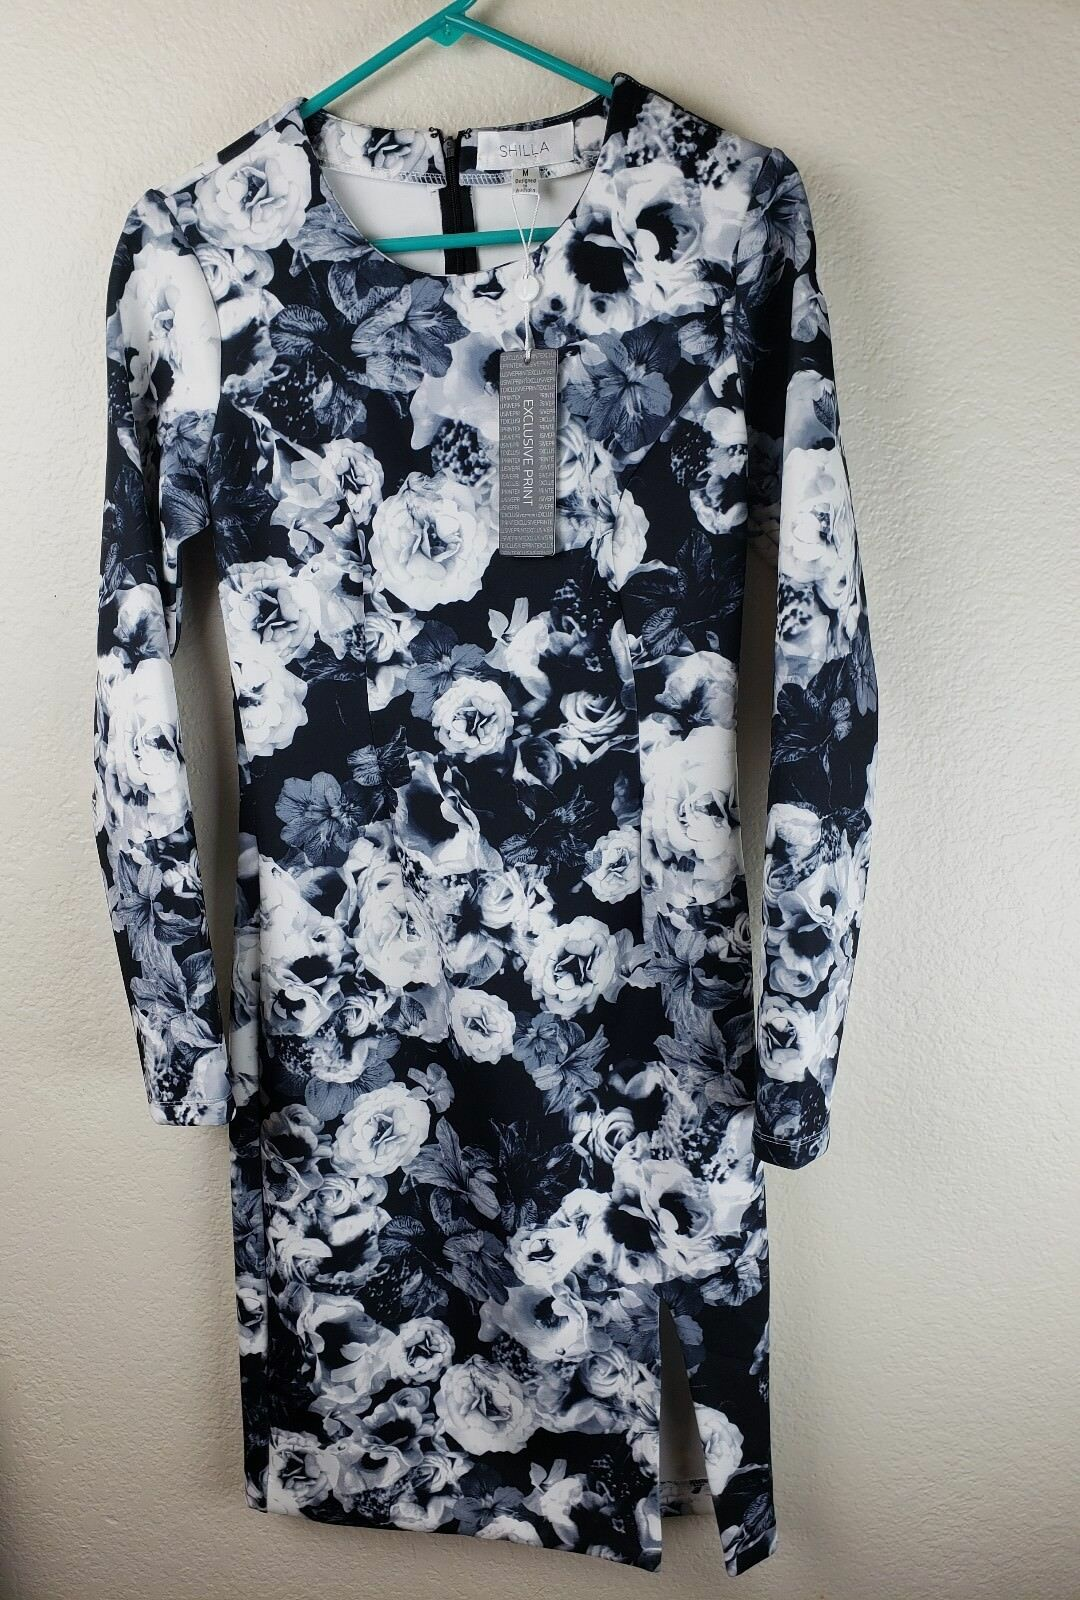 Women's Dress Shilla Shakers Floral Body-con Midi Dress Floral NWT, Medium